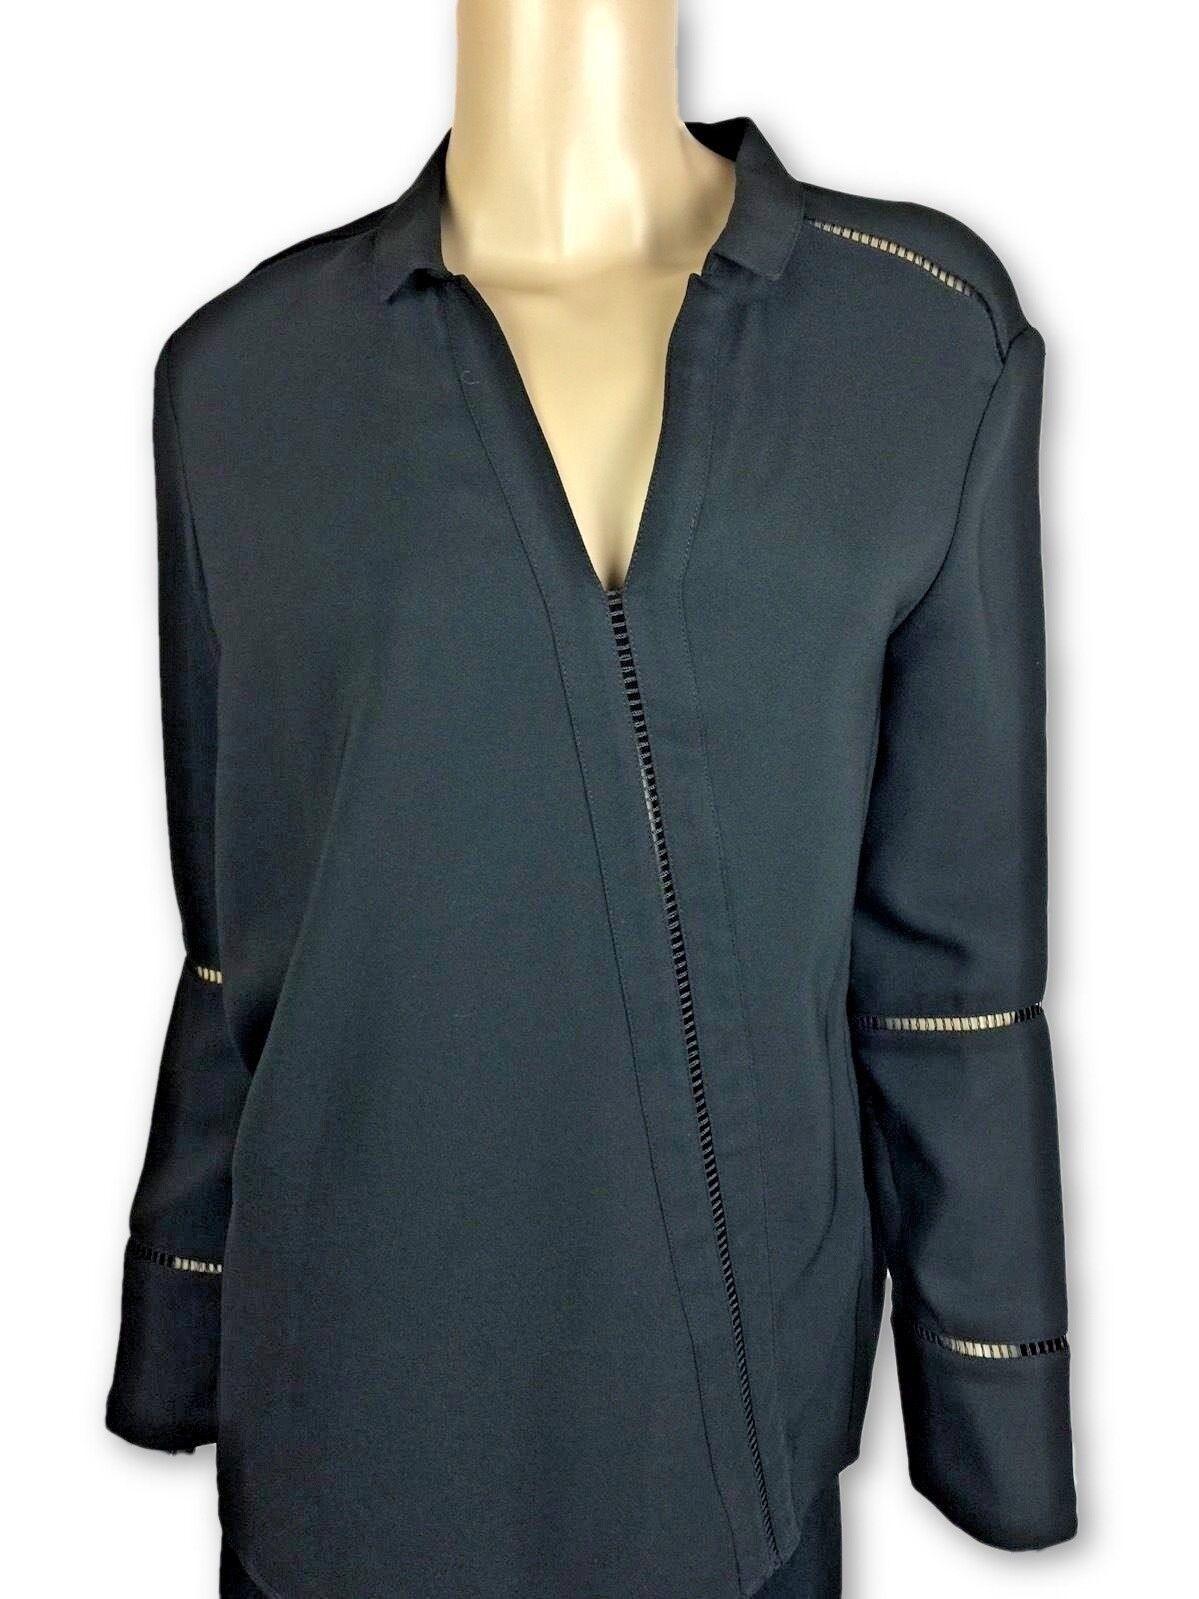 AOTC Größe 0 schwarz Top Blouse Slanted Cut Out Long Sleeve V-NeckMSRP